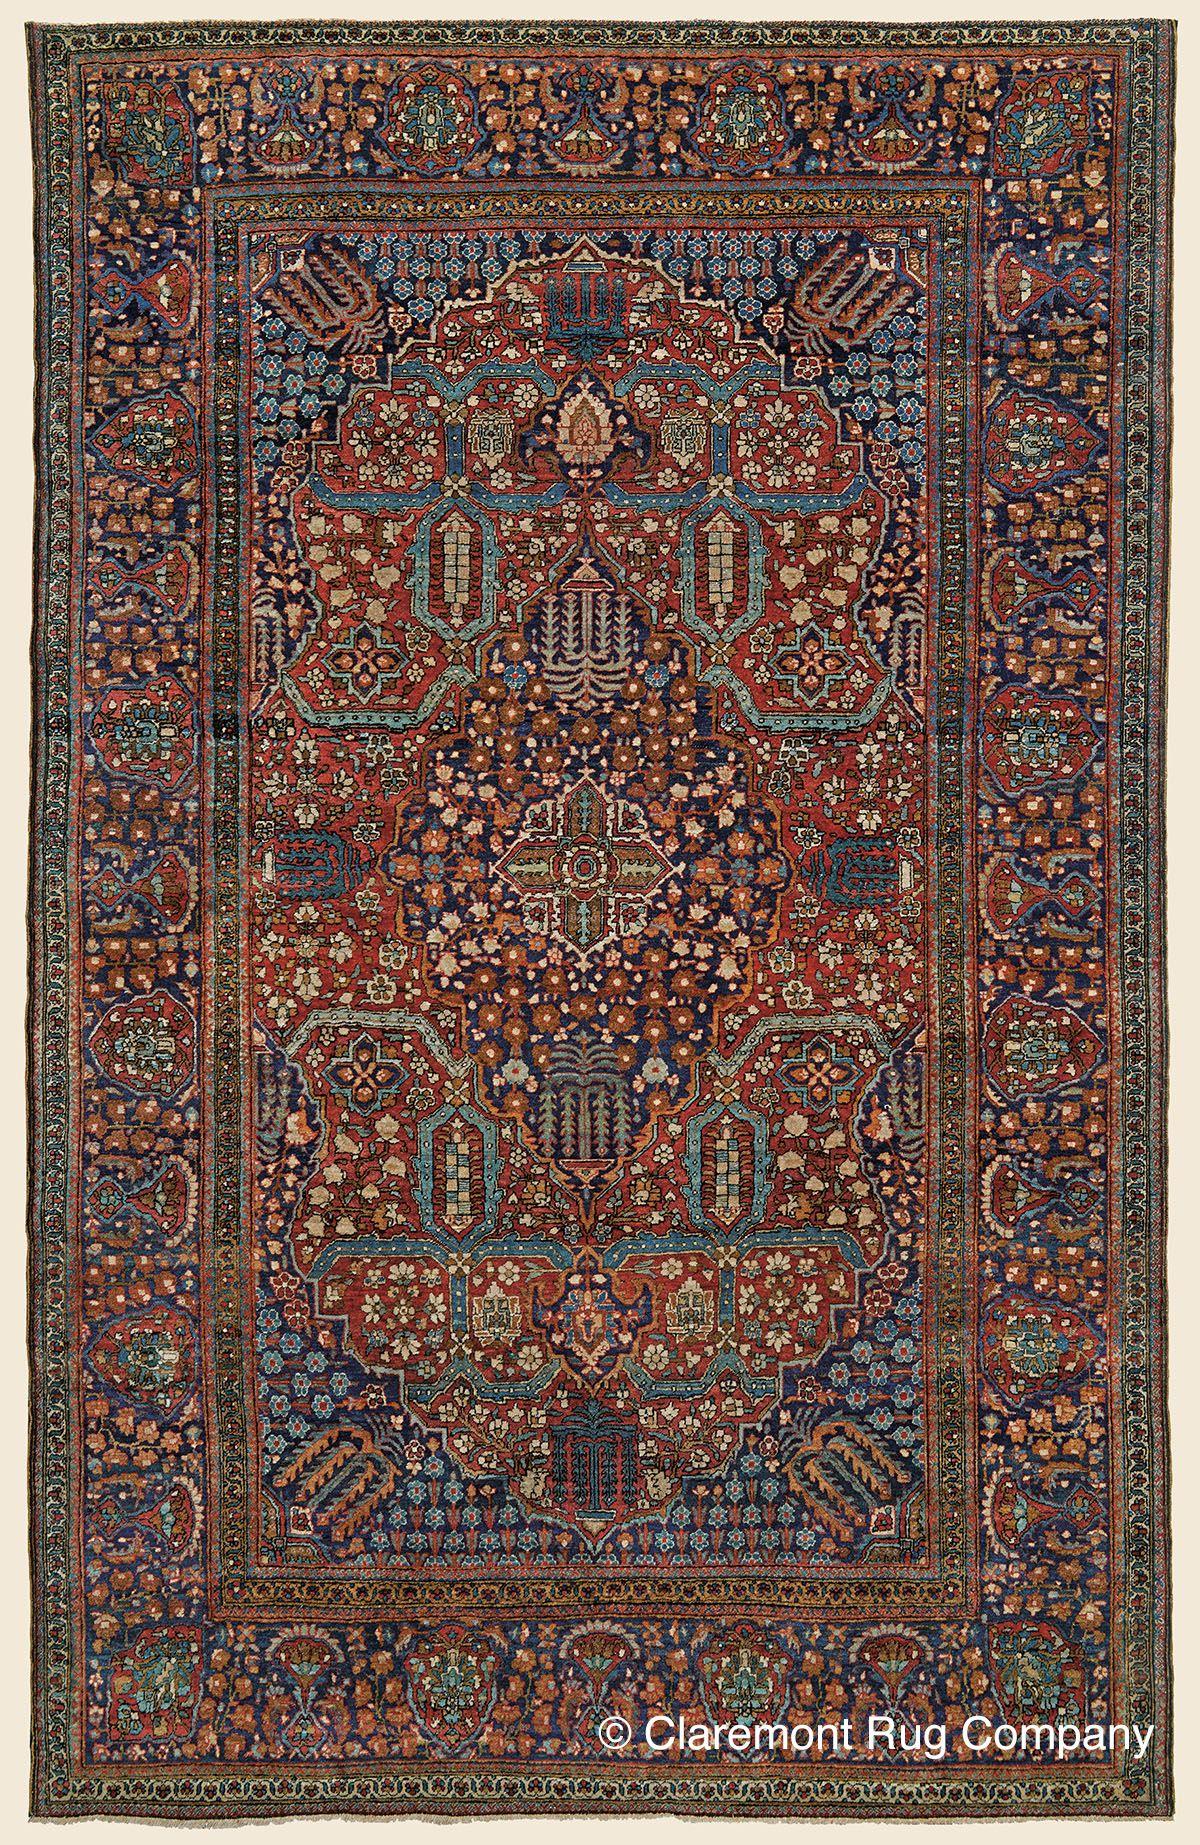 Antique Late 19th Century Connoisseur Caliber Central Persian